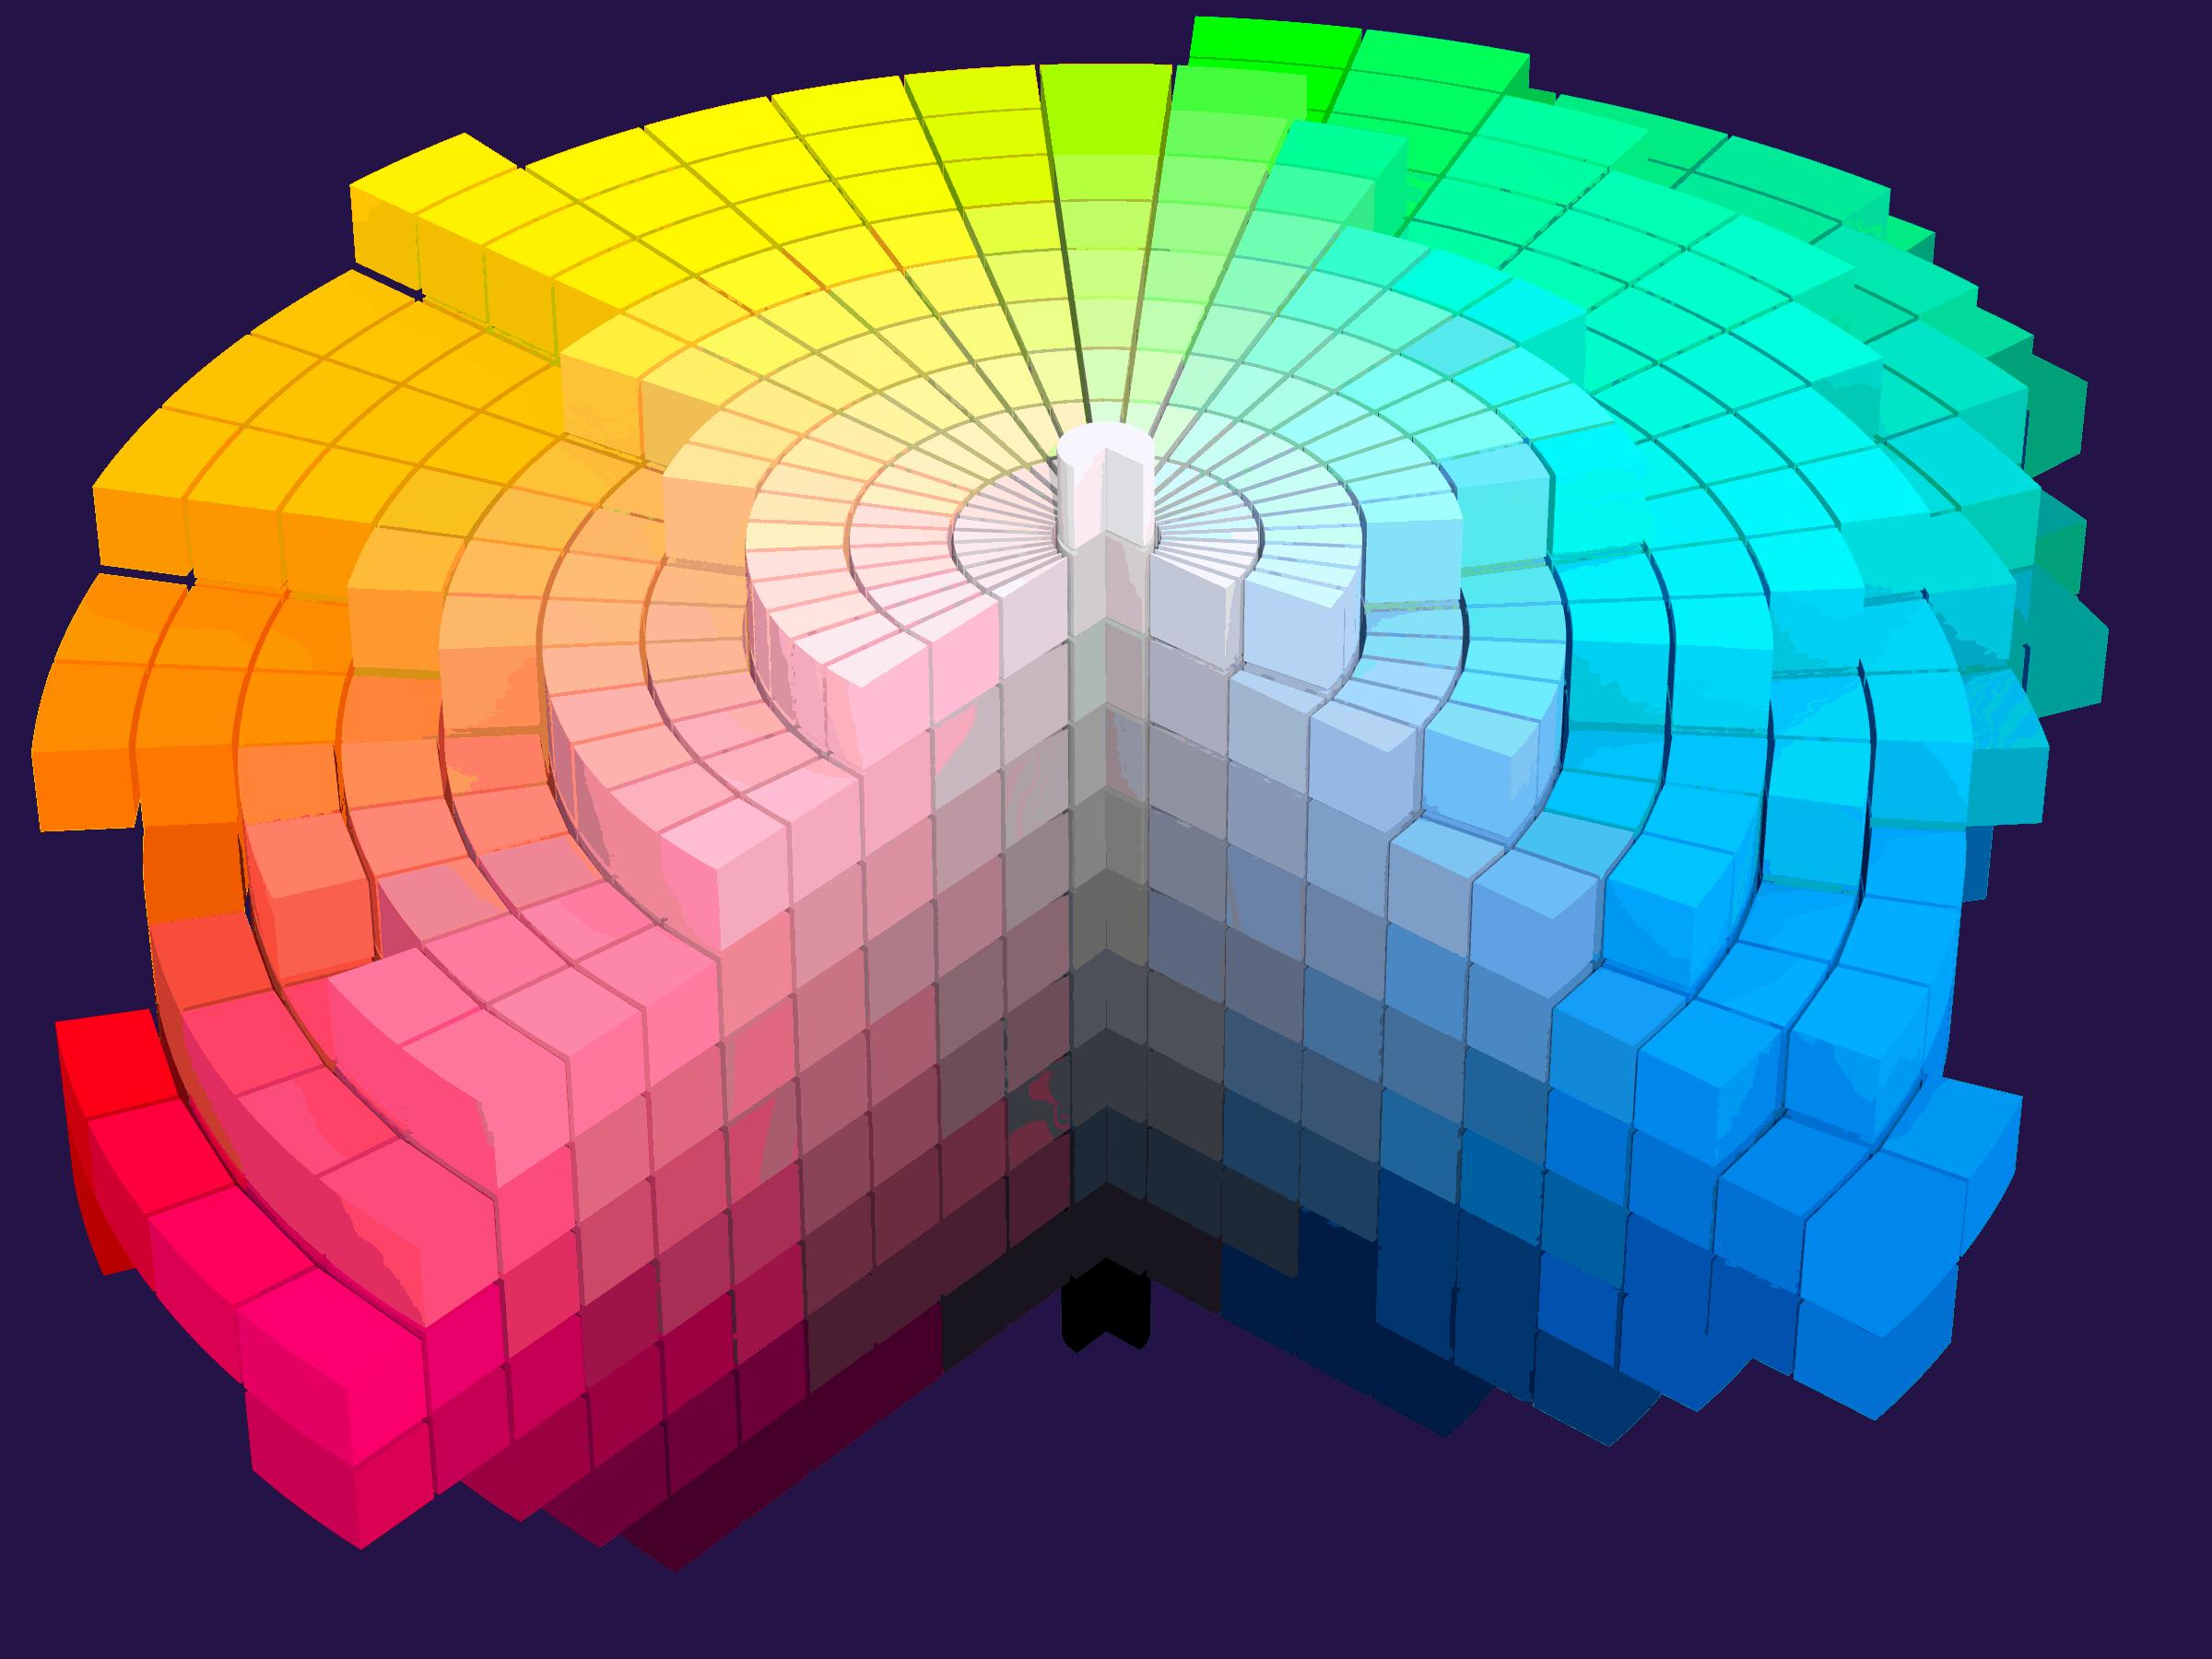 08 Making Of Light Luce, Colore E Visione Le Basi E Le Giuste Parole Munsell 1943 Color Solid Cylindrical Coordinates